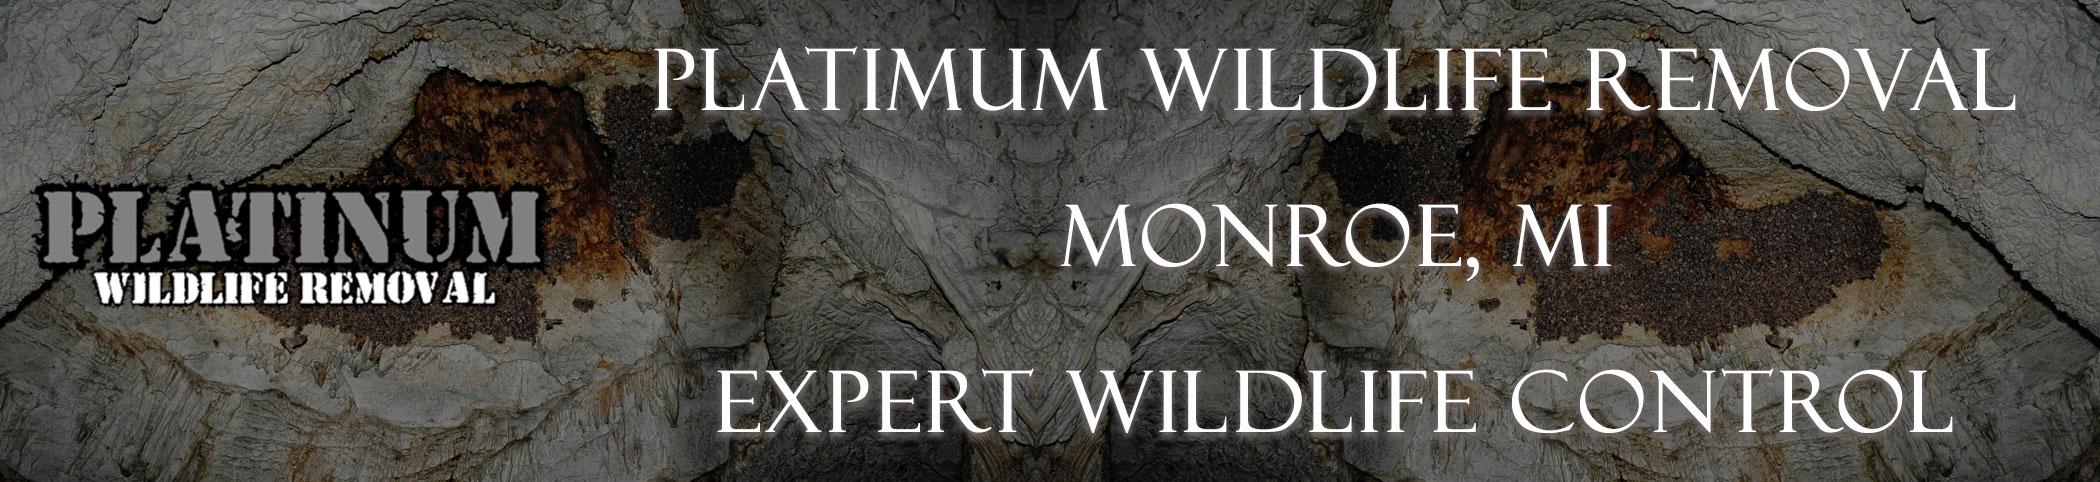 Platinum-Wildlife-Removal_monroe_mi